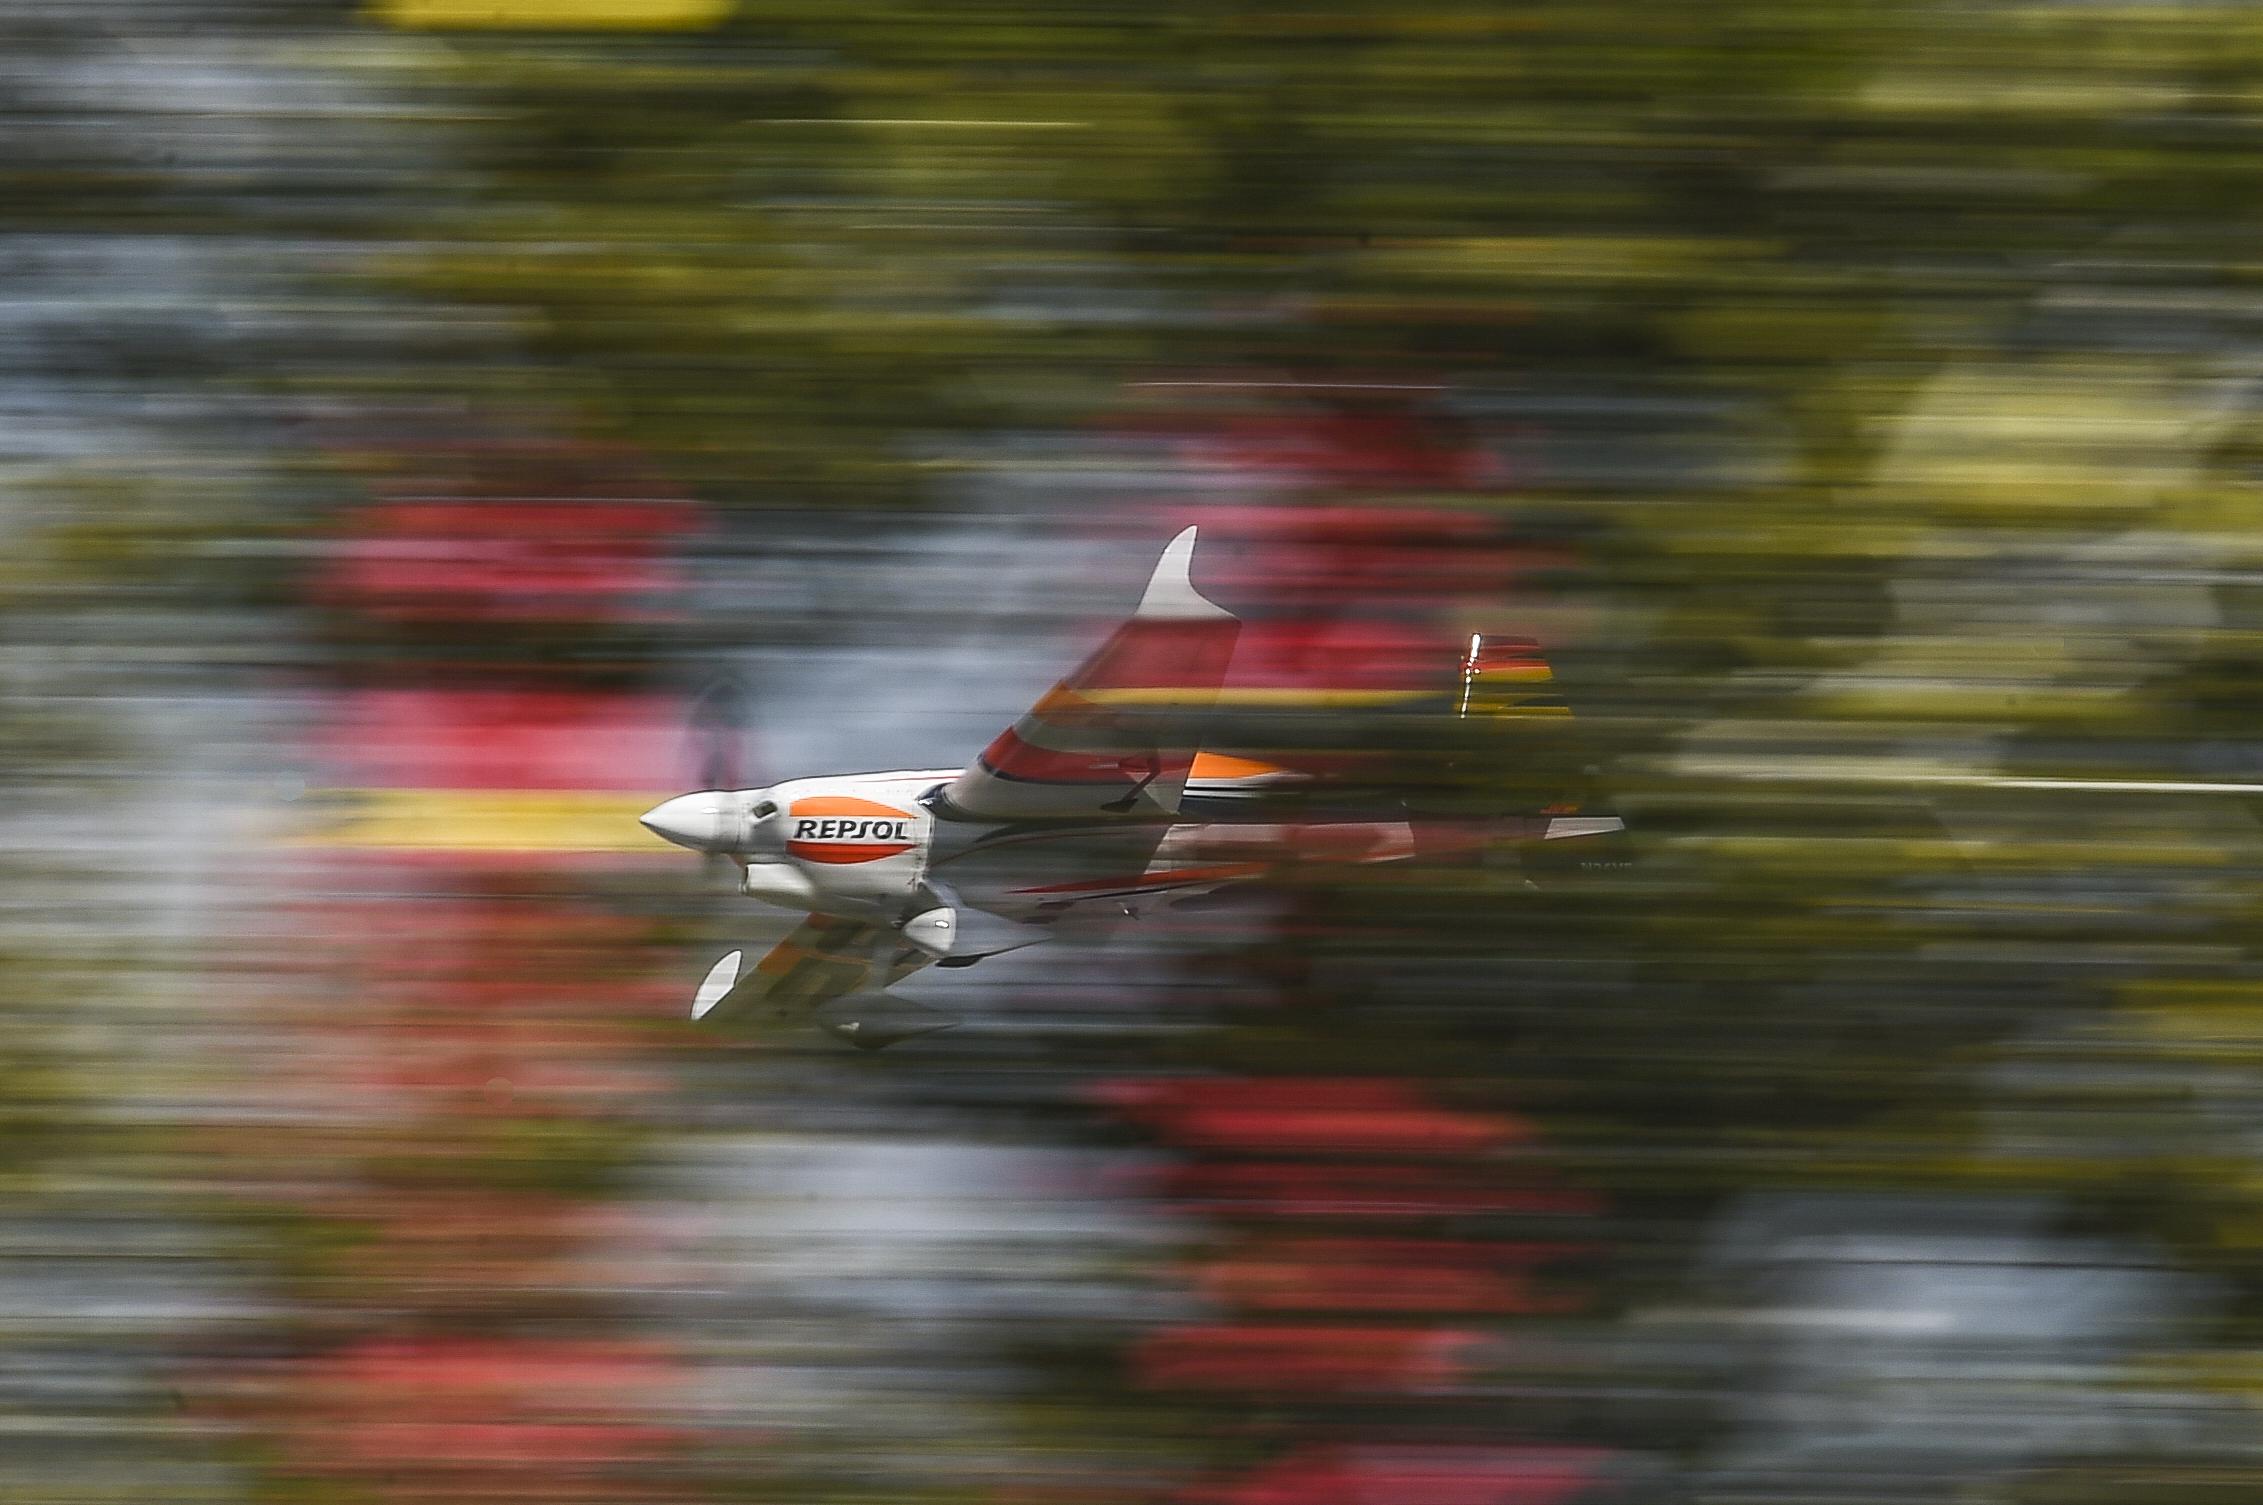 Juan Velarde soars at IMS during the Red Bull Air Race.